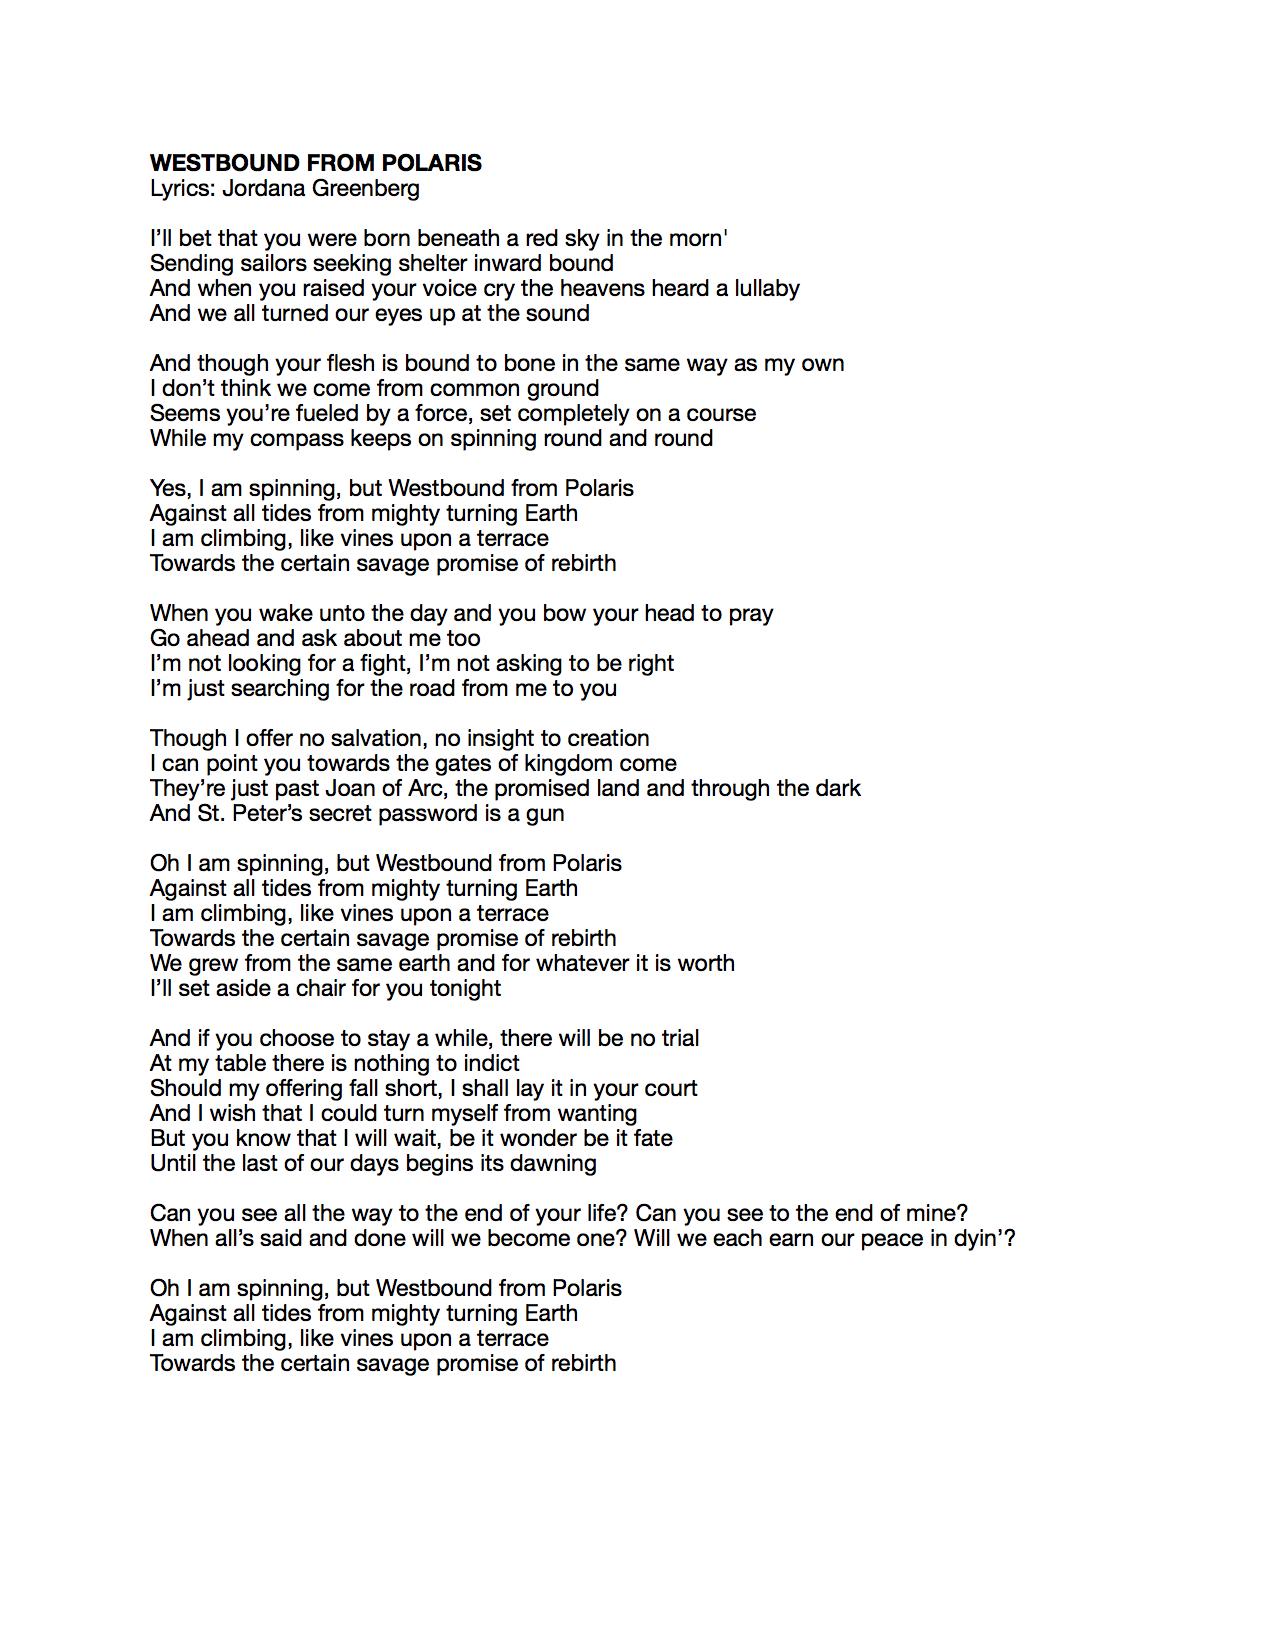 Westbound from Polaris Lyrics.jpeg